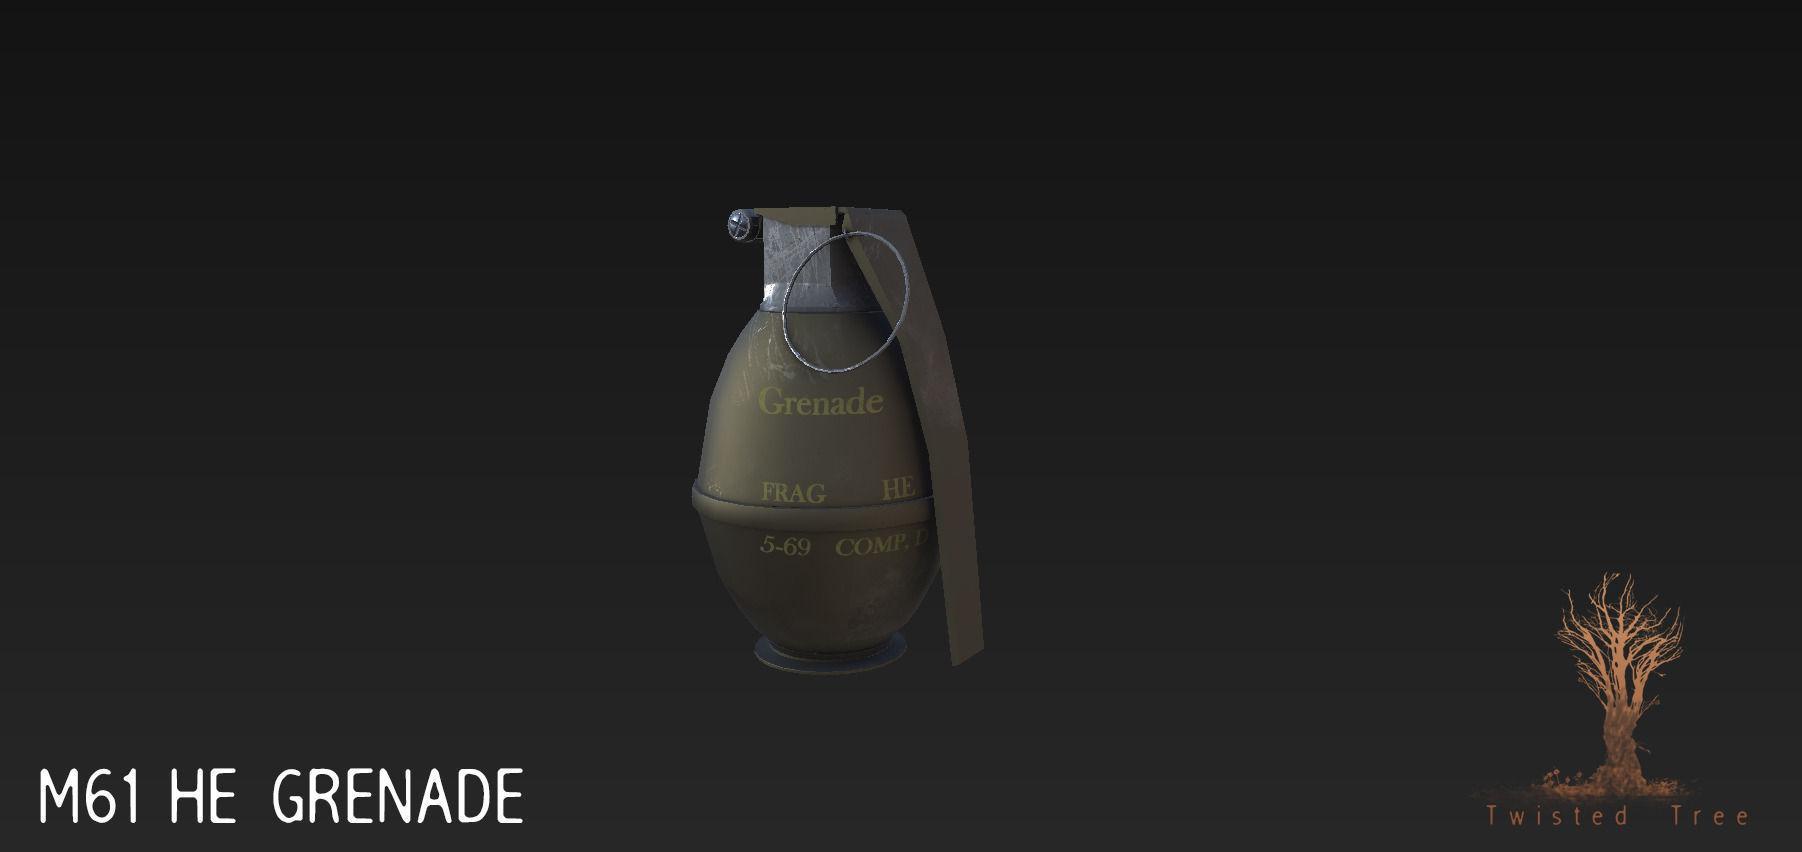 m61 grenade - photo #25